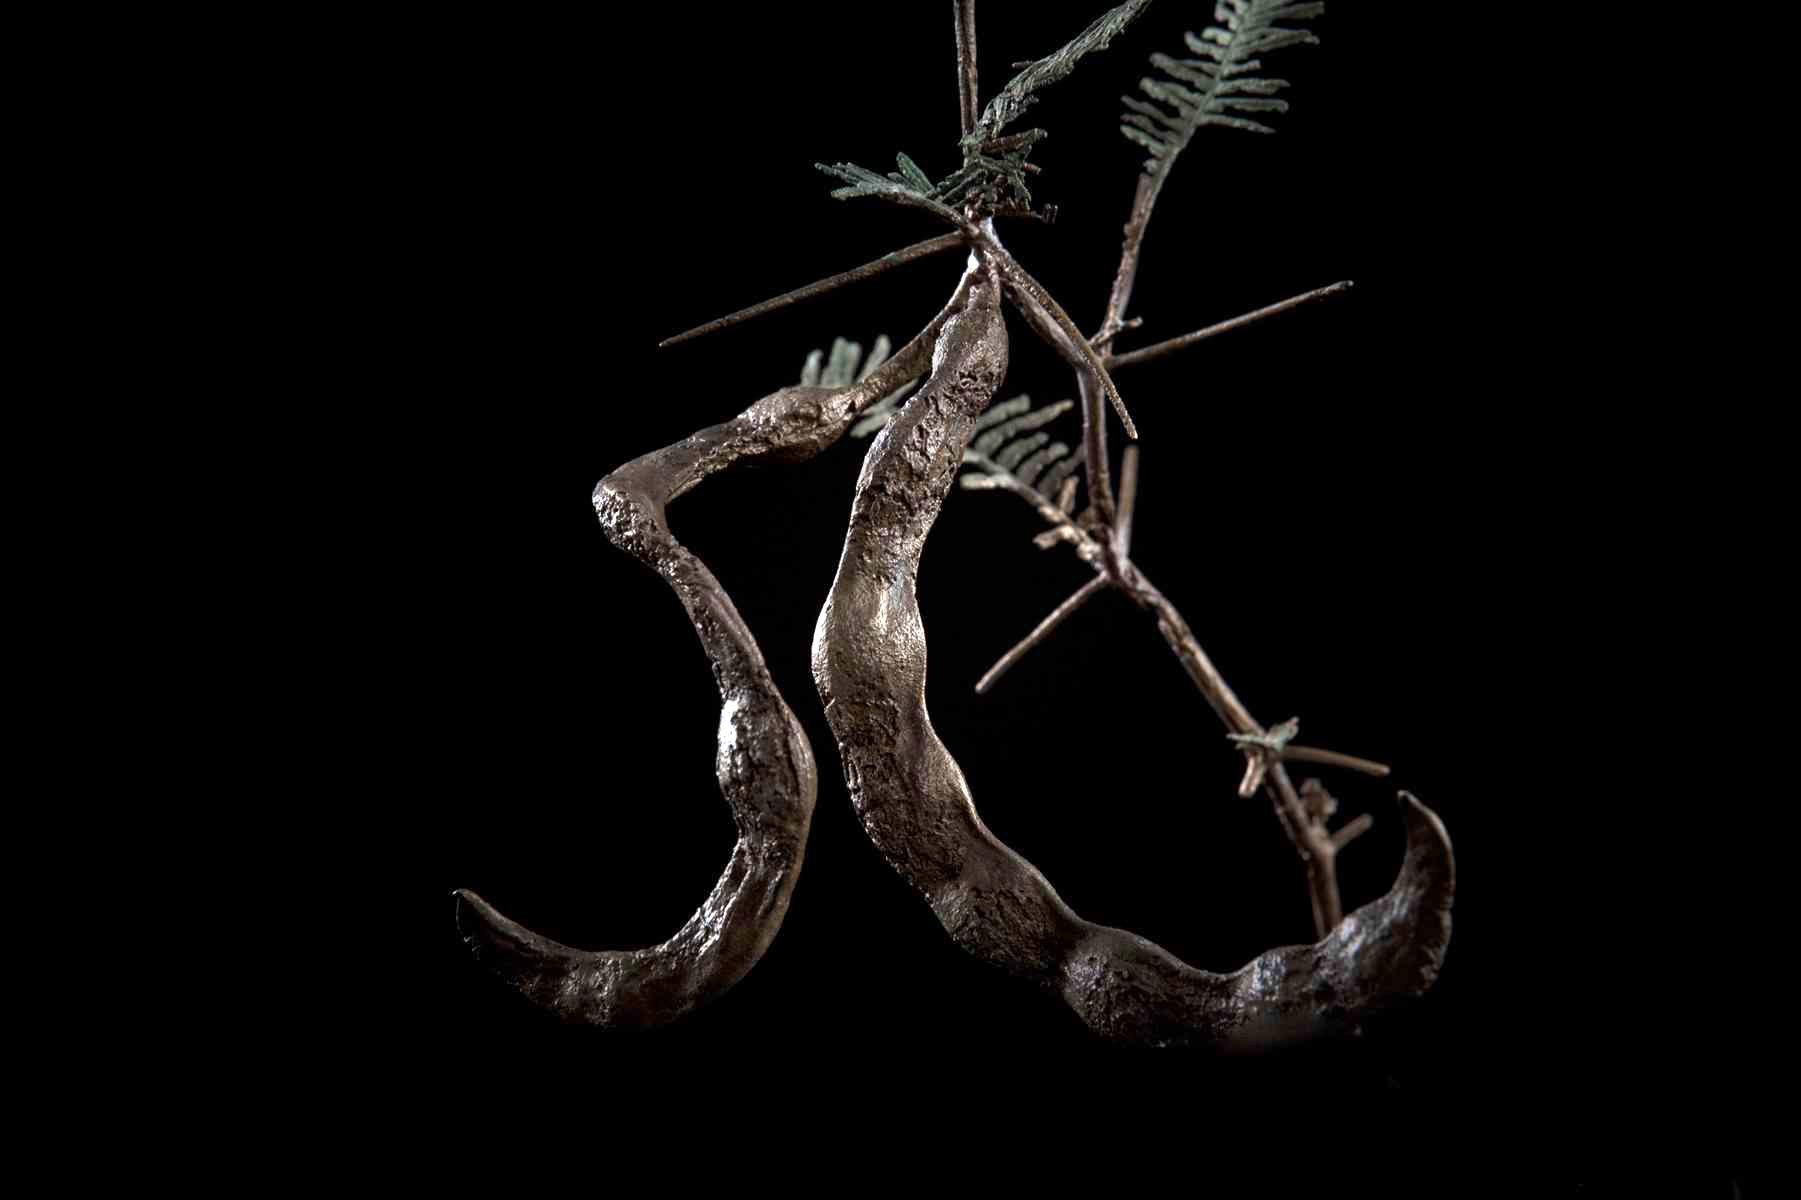 NicBladen_Botanicals_Grey Camel Thorn, Vaalkameeldoring Mokholo-317.jpg